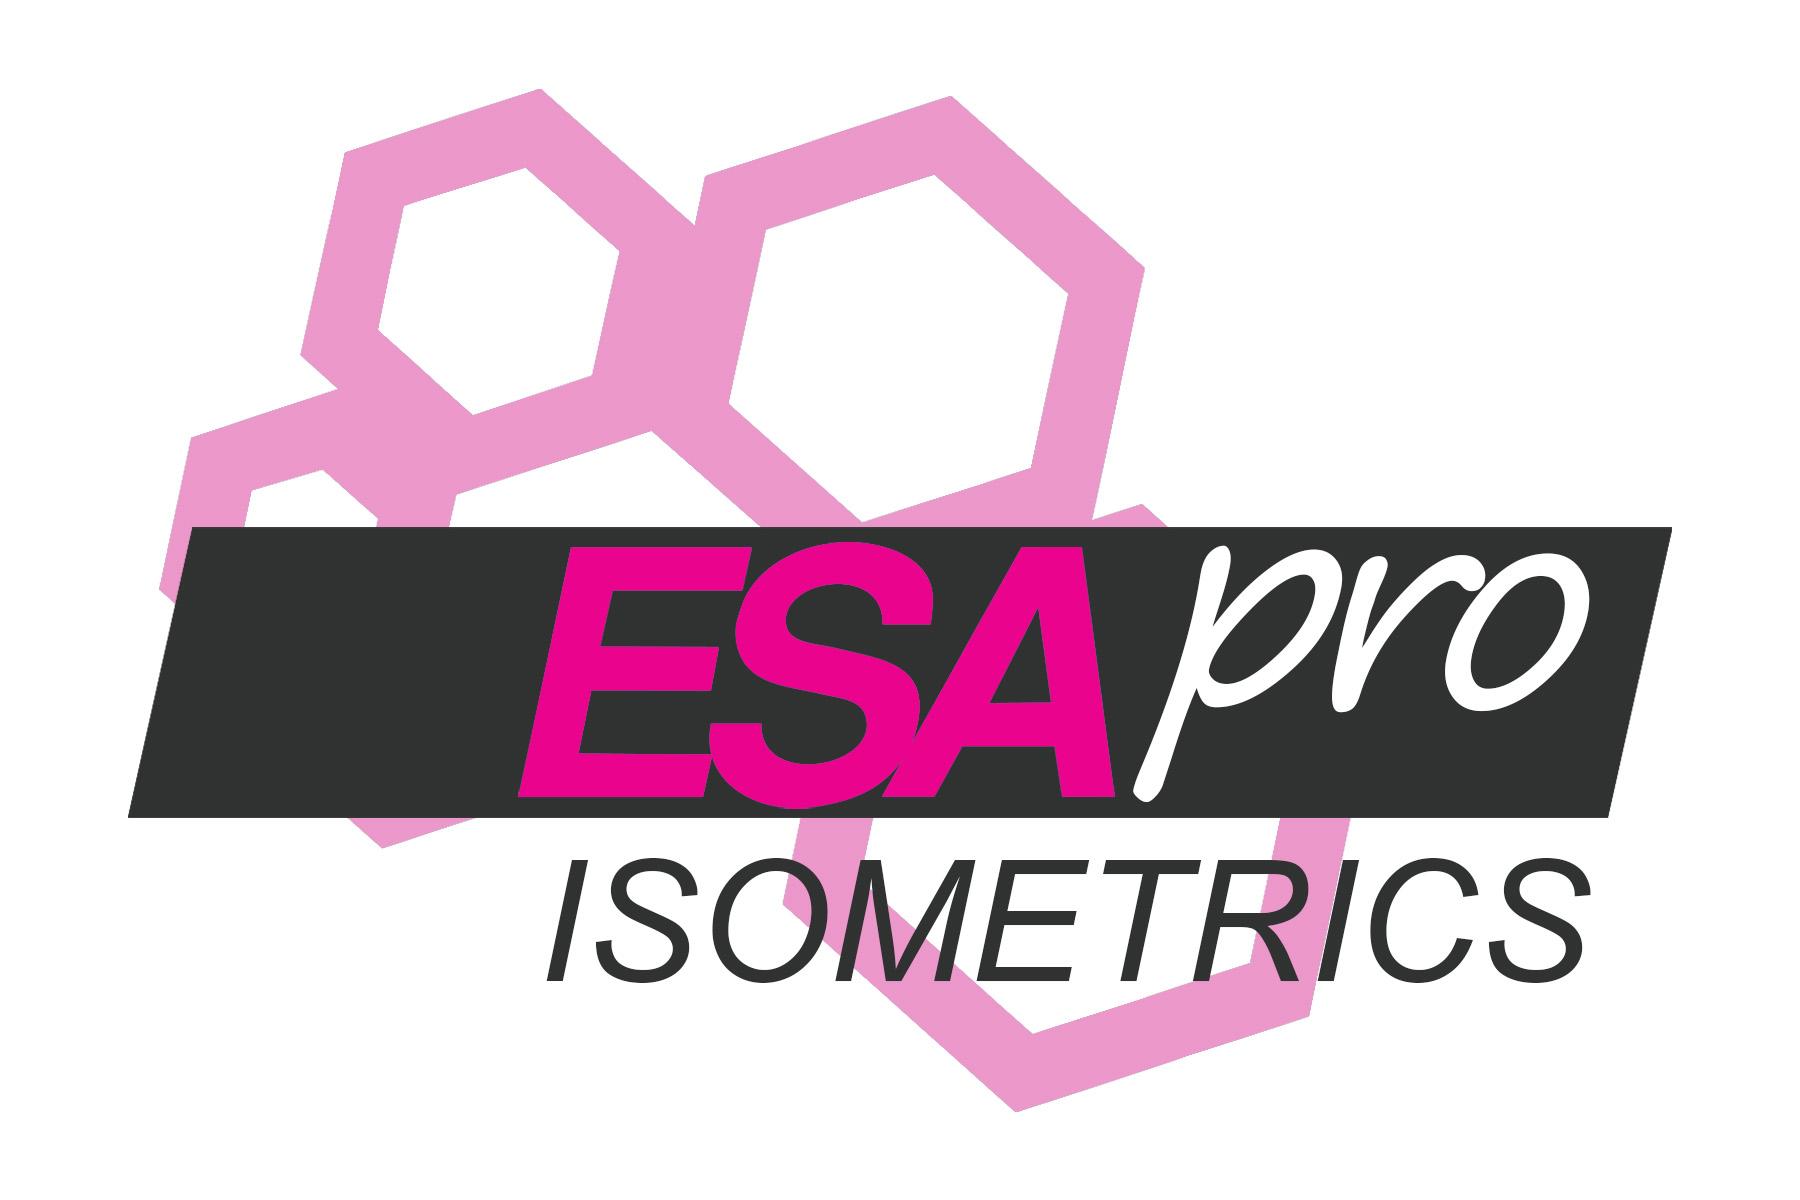 esapro-isometrics-image-1